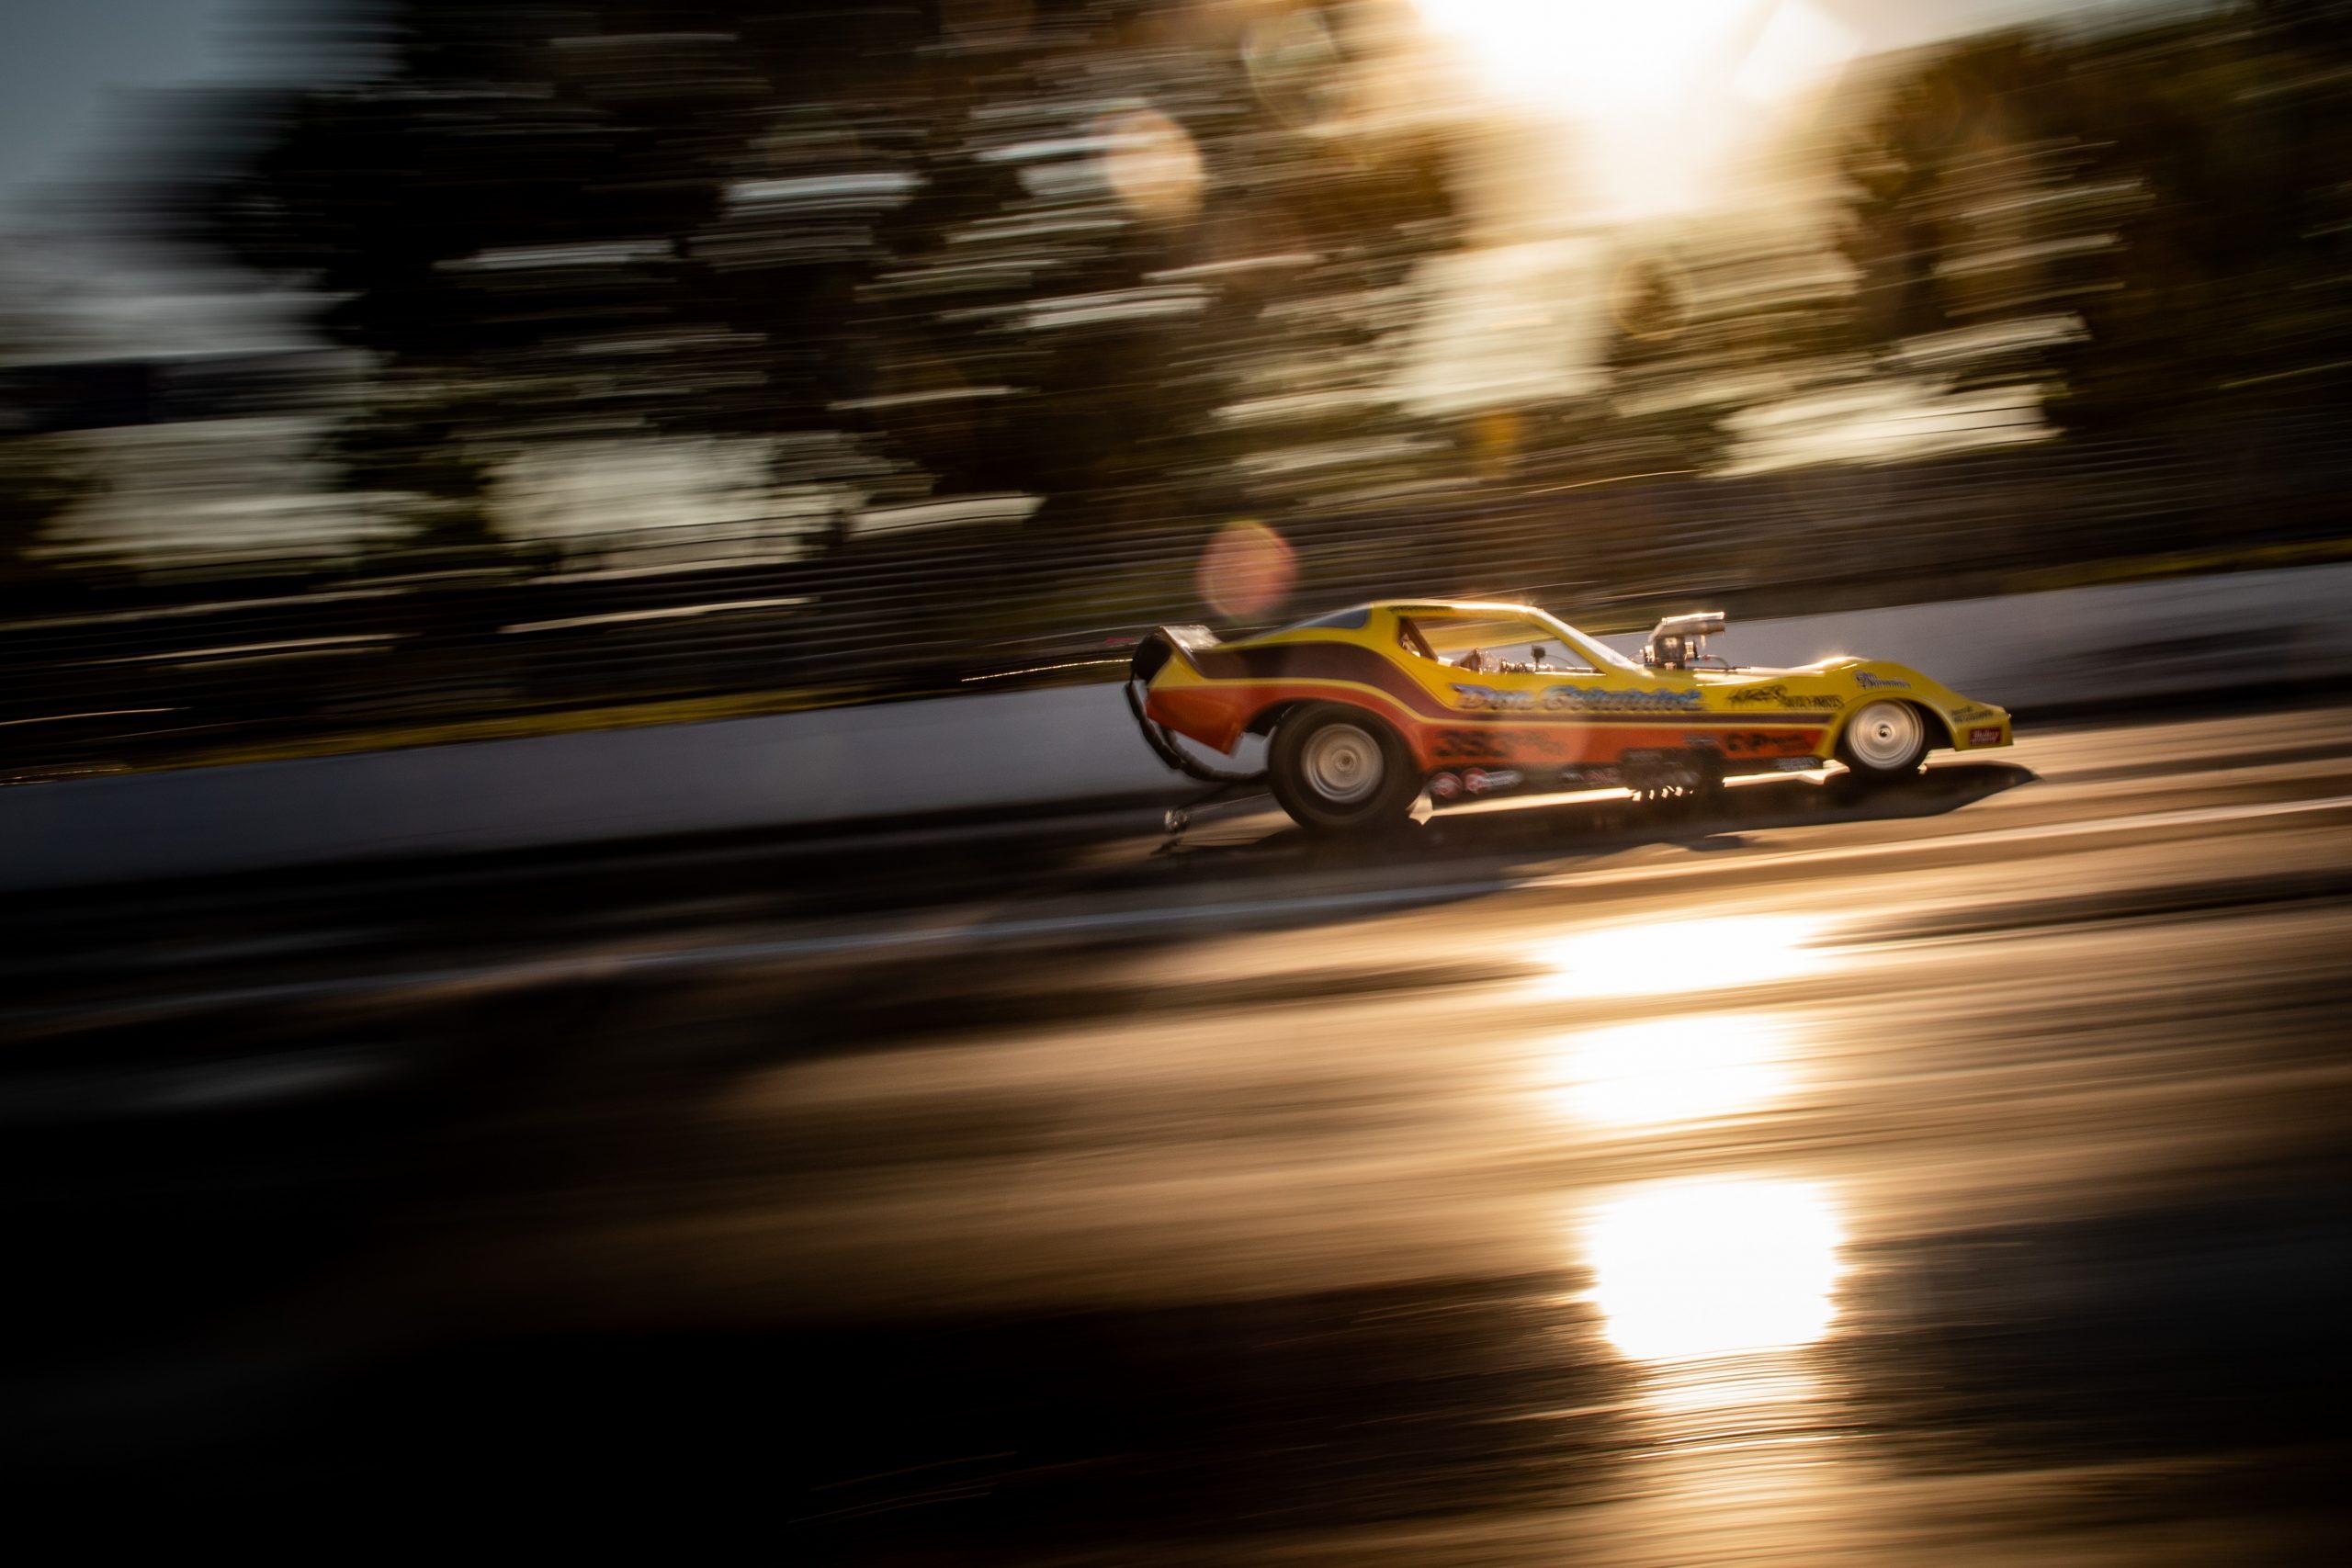 Milan Nostalgia Drags Corvette funny car